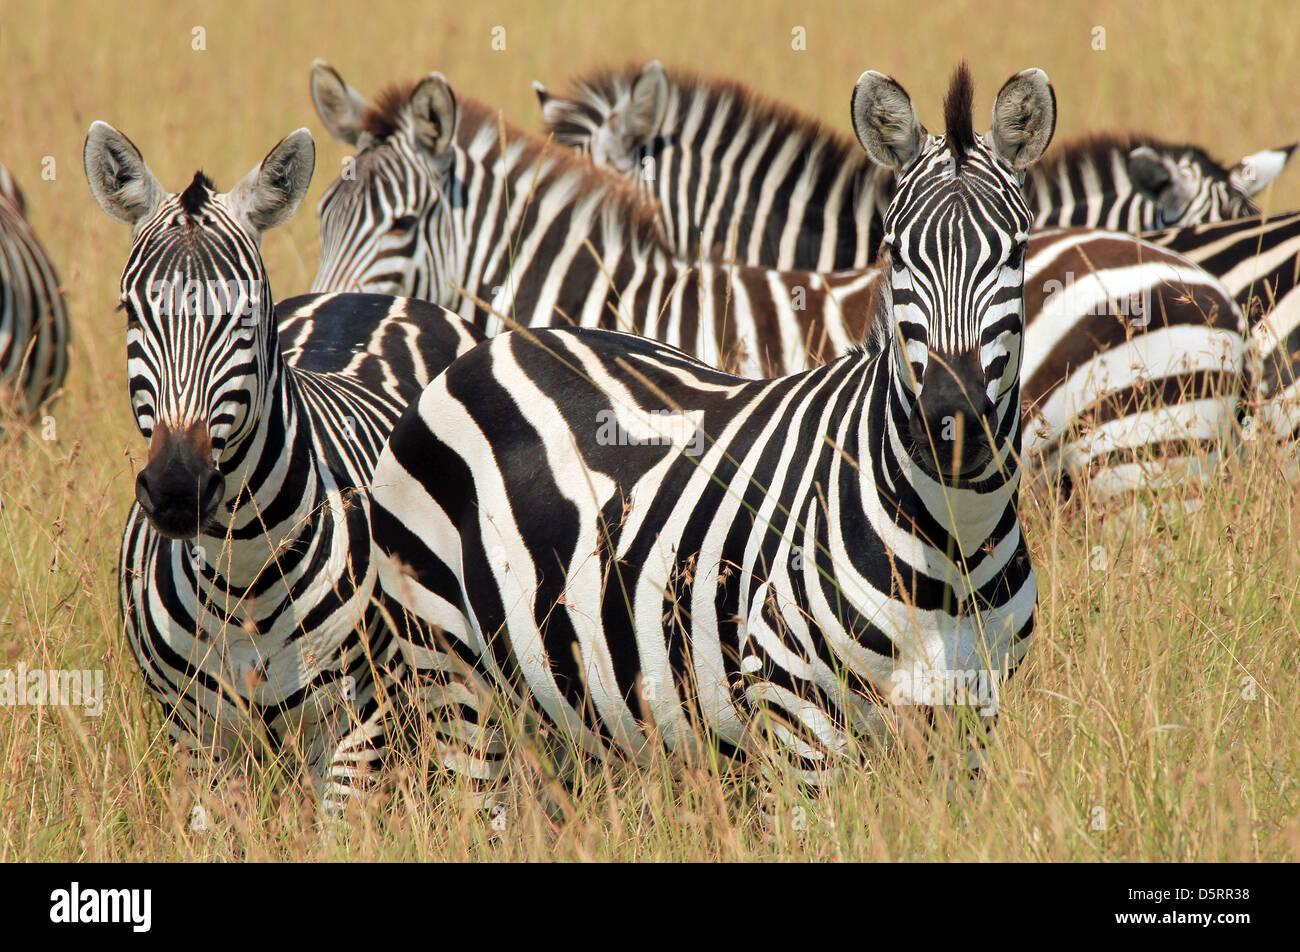 Plains Zebras (Equus Quagga) in High Grass, Maasai Mara, Kenya - Stock Image